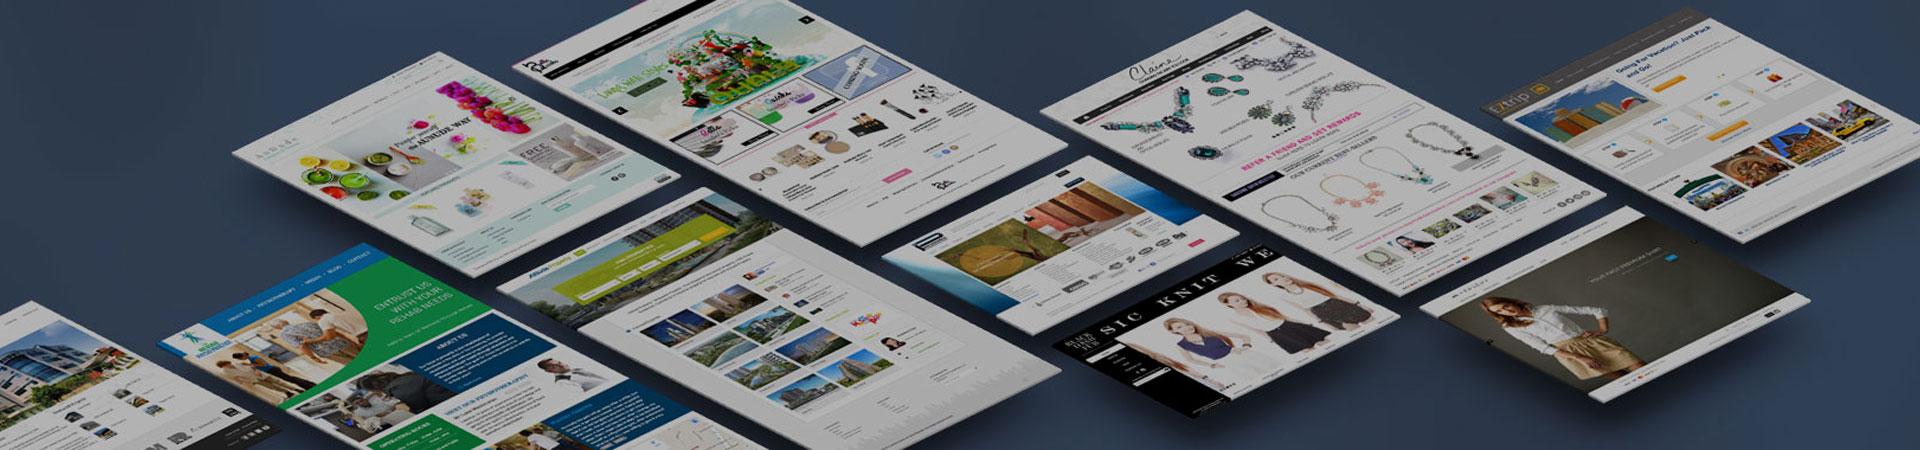 Website Design Singapore - Dolphin Capital Asia Pacific